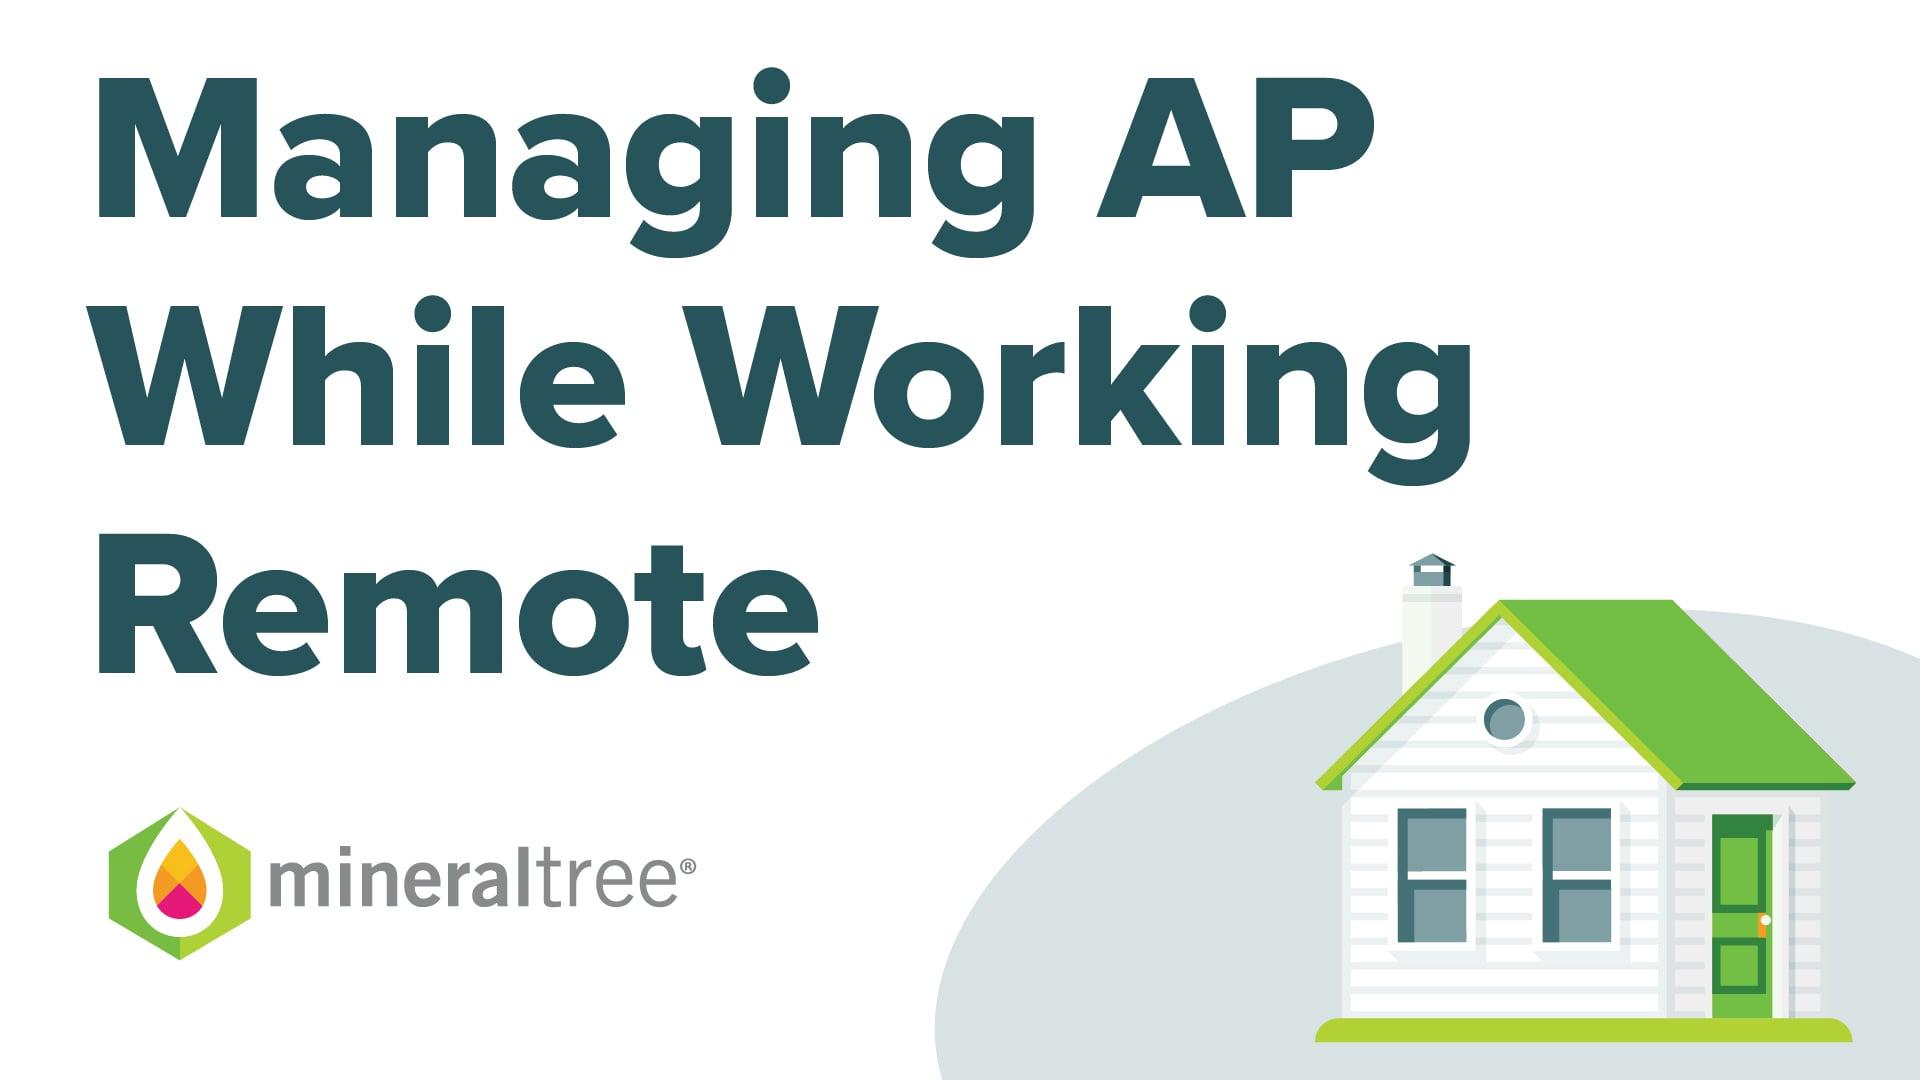 Managing AP While Working Remote